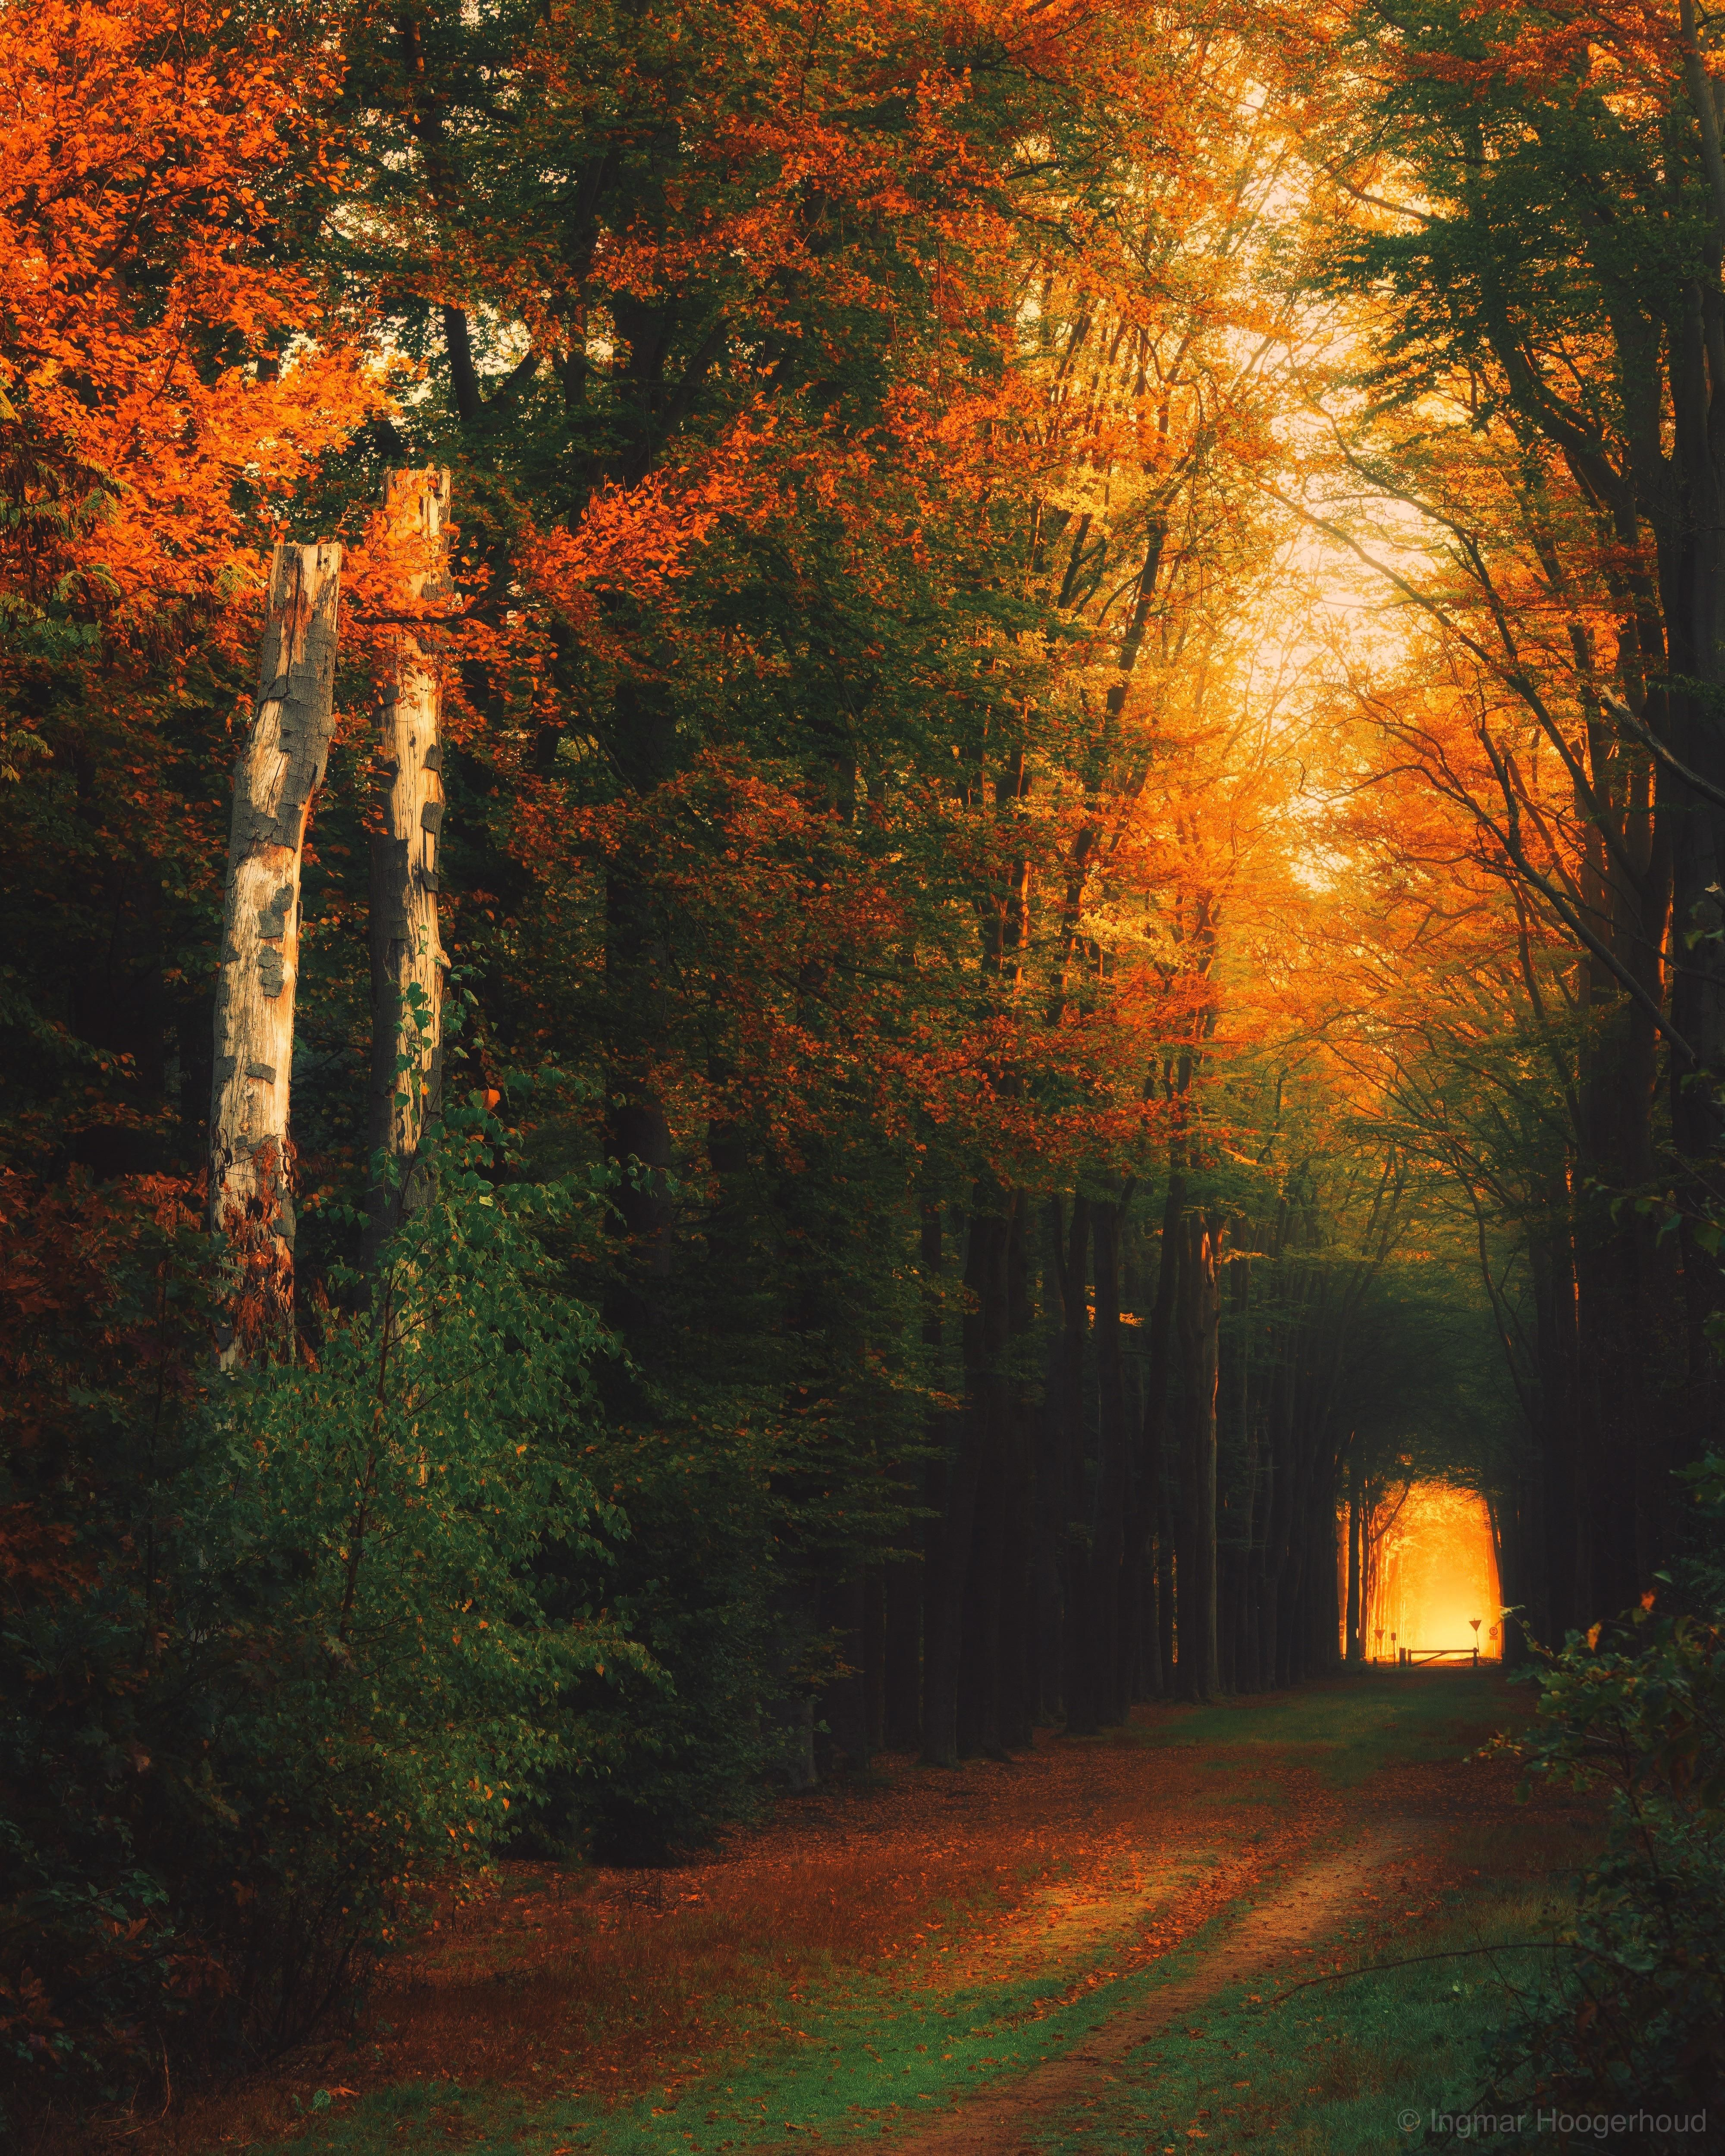 Autumn Forest Doetinchem Netherlands 4000x5000 Autumn Landscape Forest Photography Autumn Forest